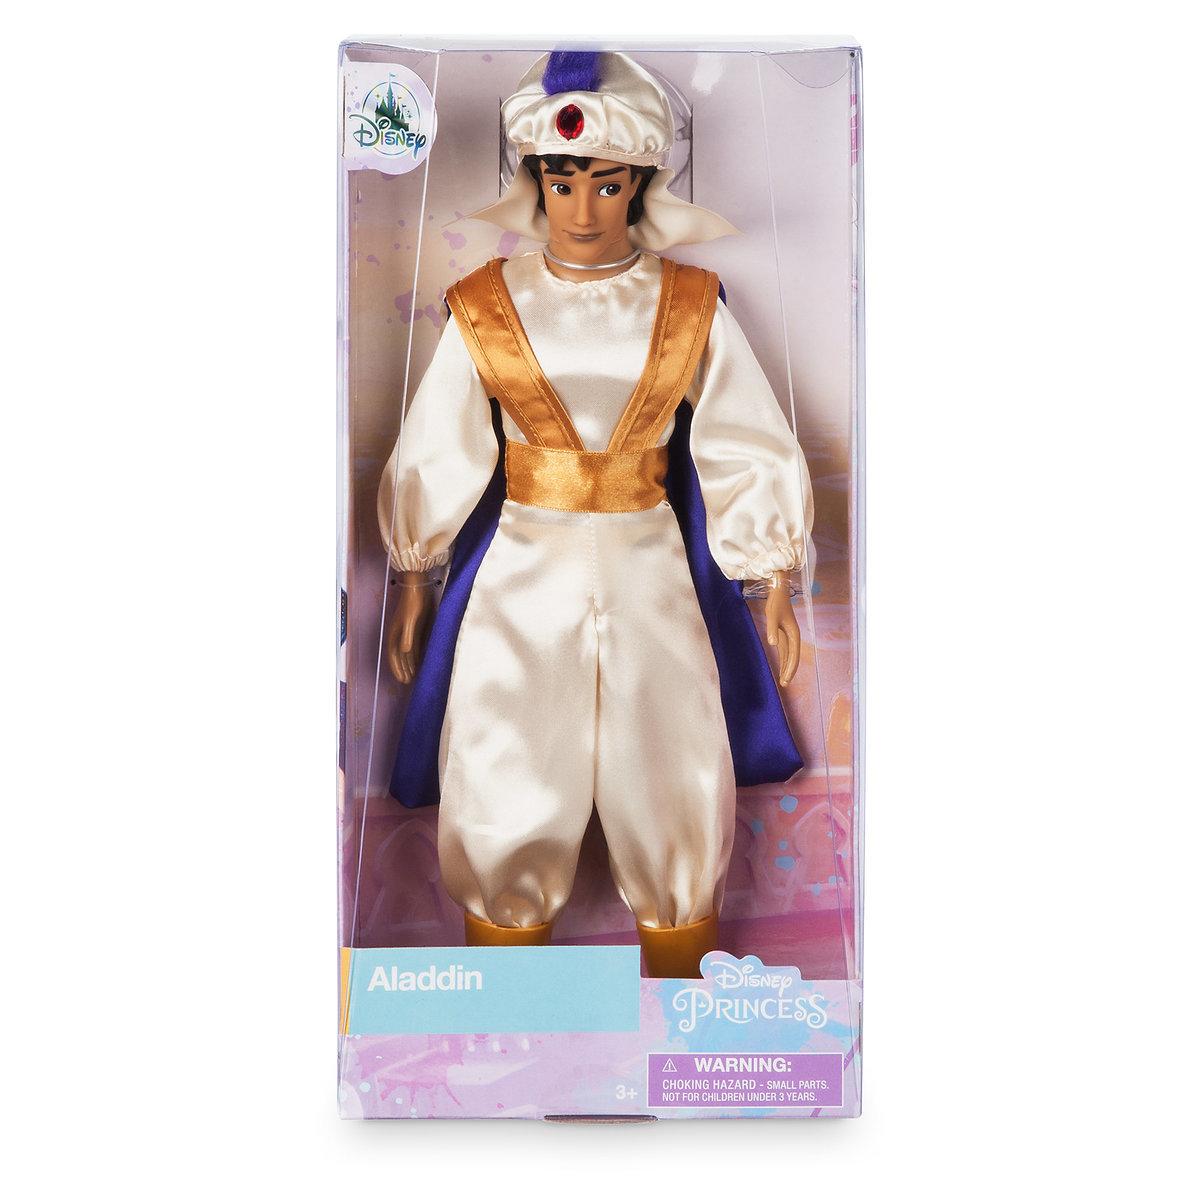 "Aladdin as Prince Ali Classic Doll - 12"" ของแท้ นำเข้าจากอเมริกา"